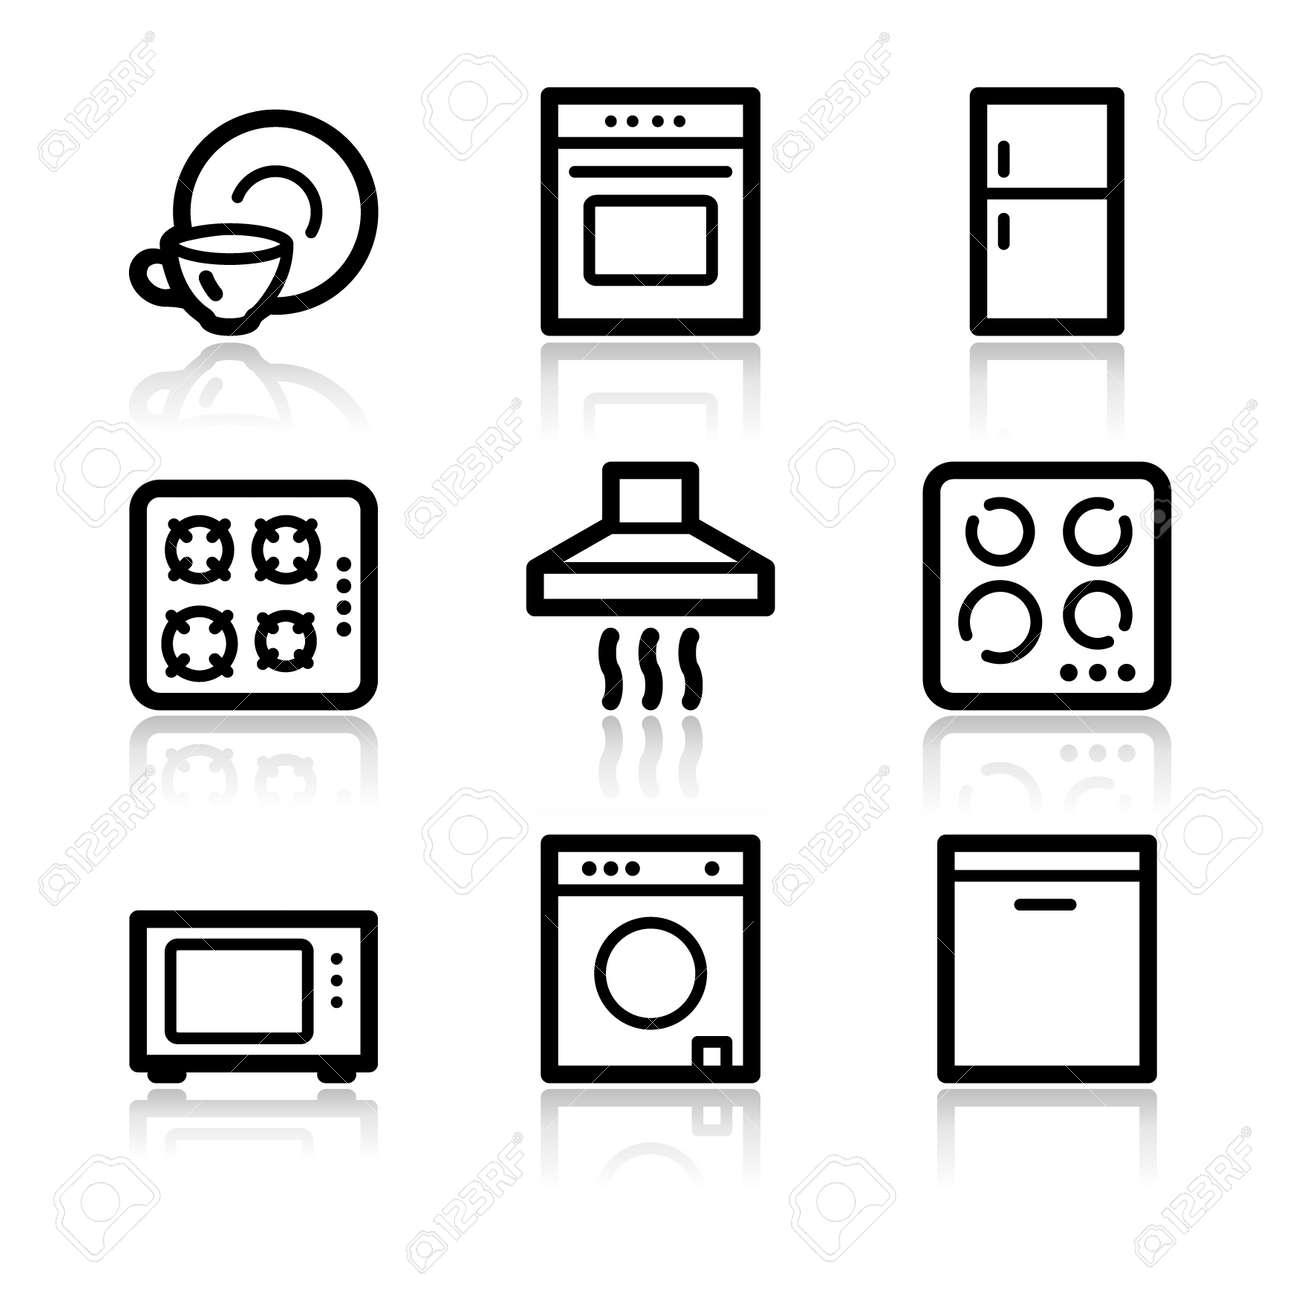 Home appliances black contour web icons V2 Stock Vector - 3754881